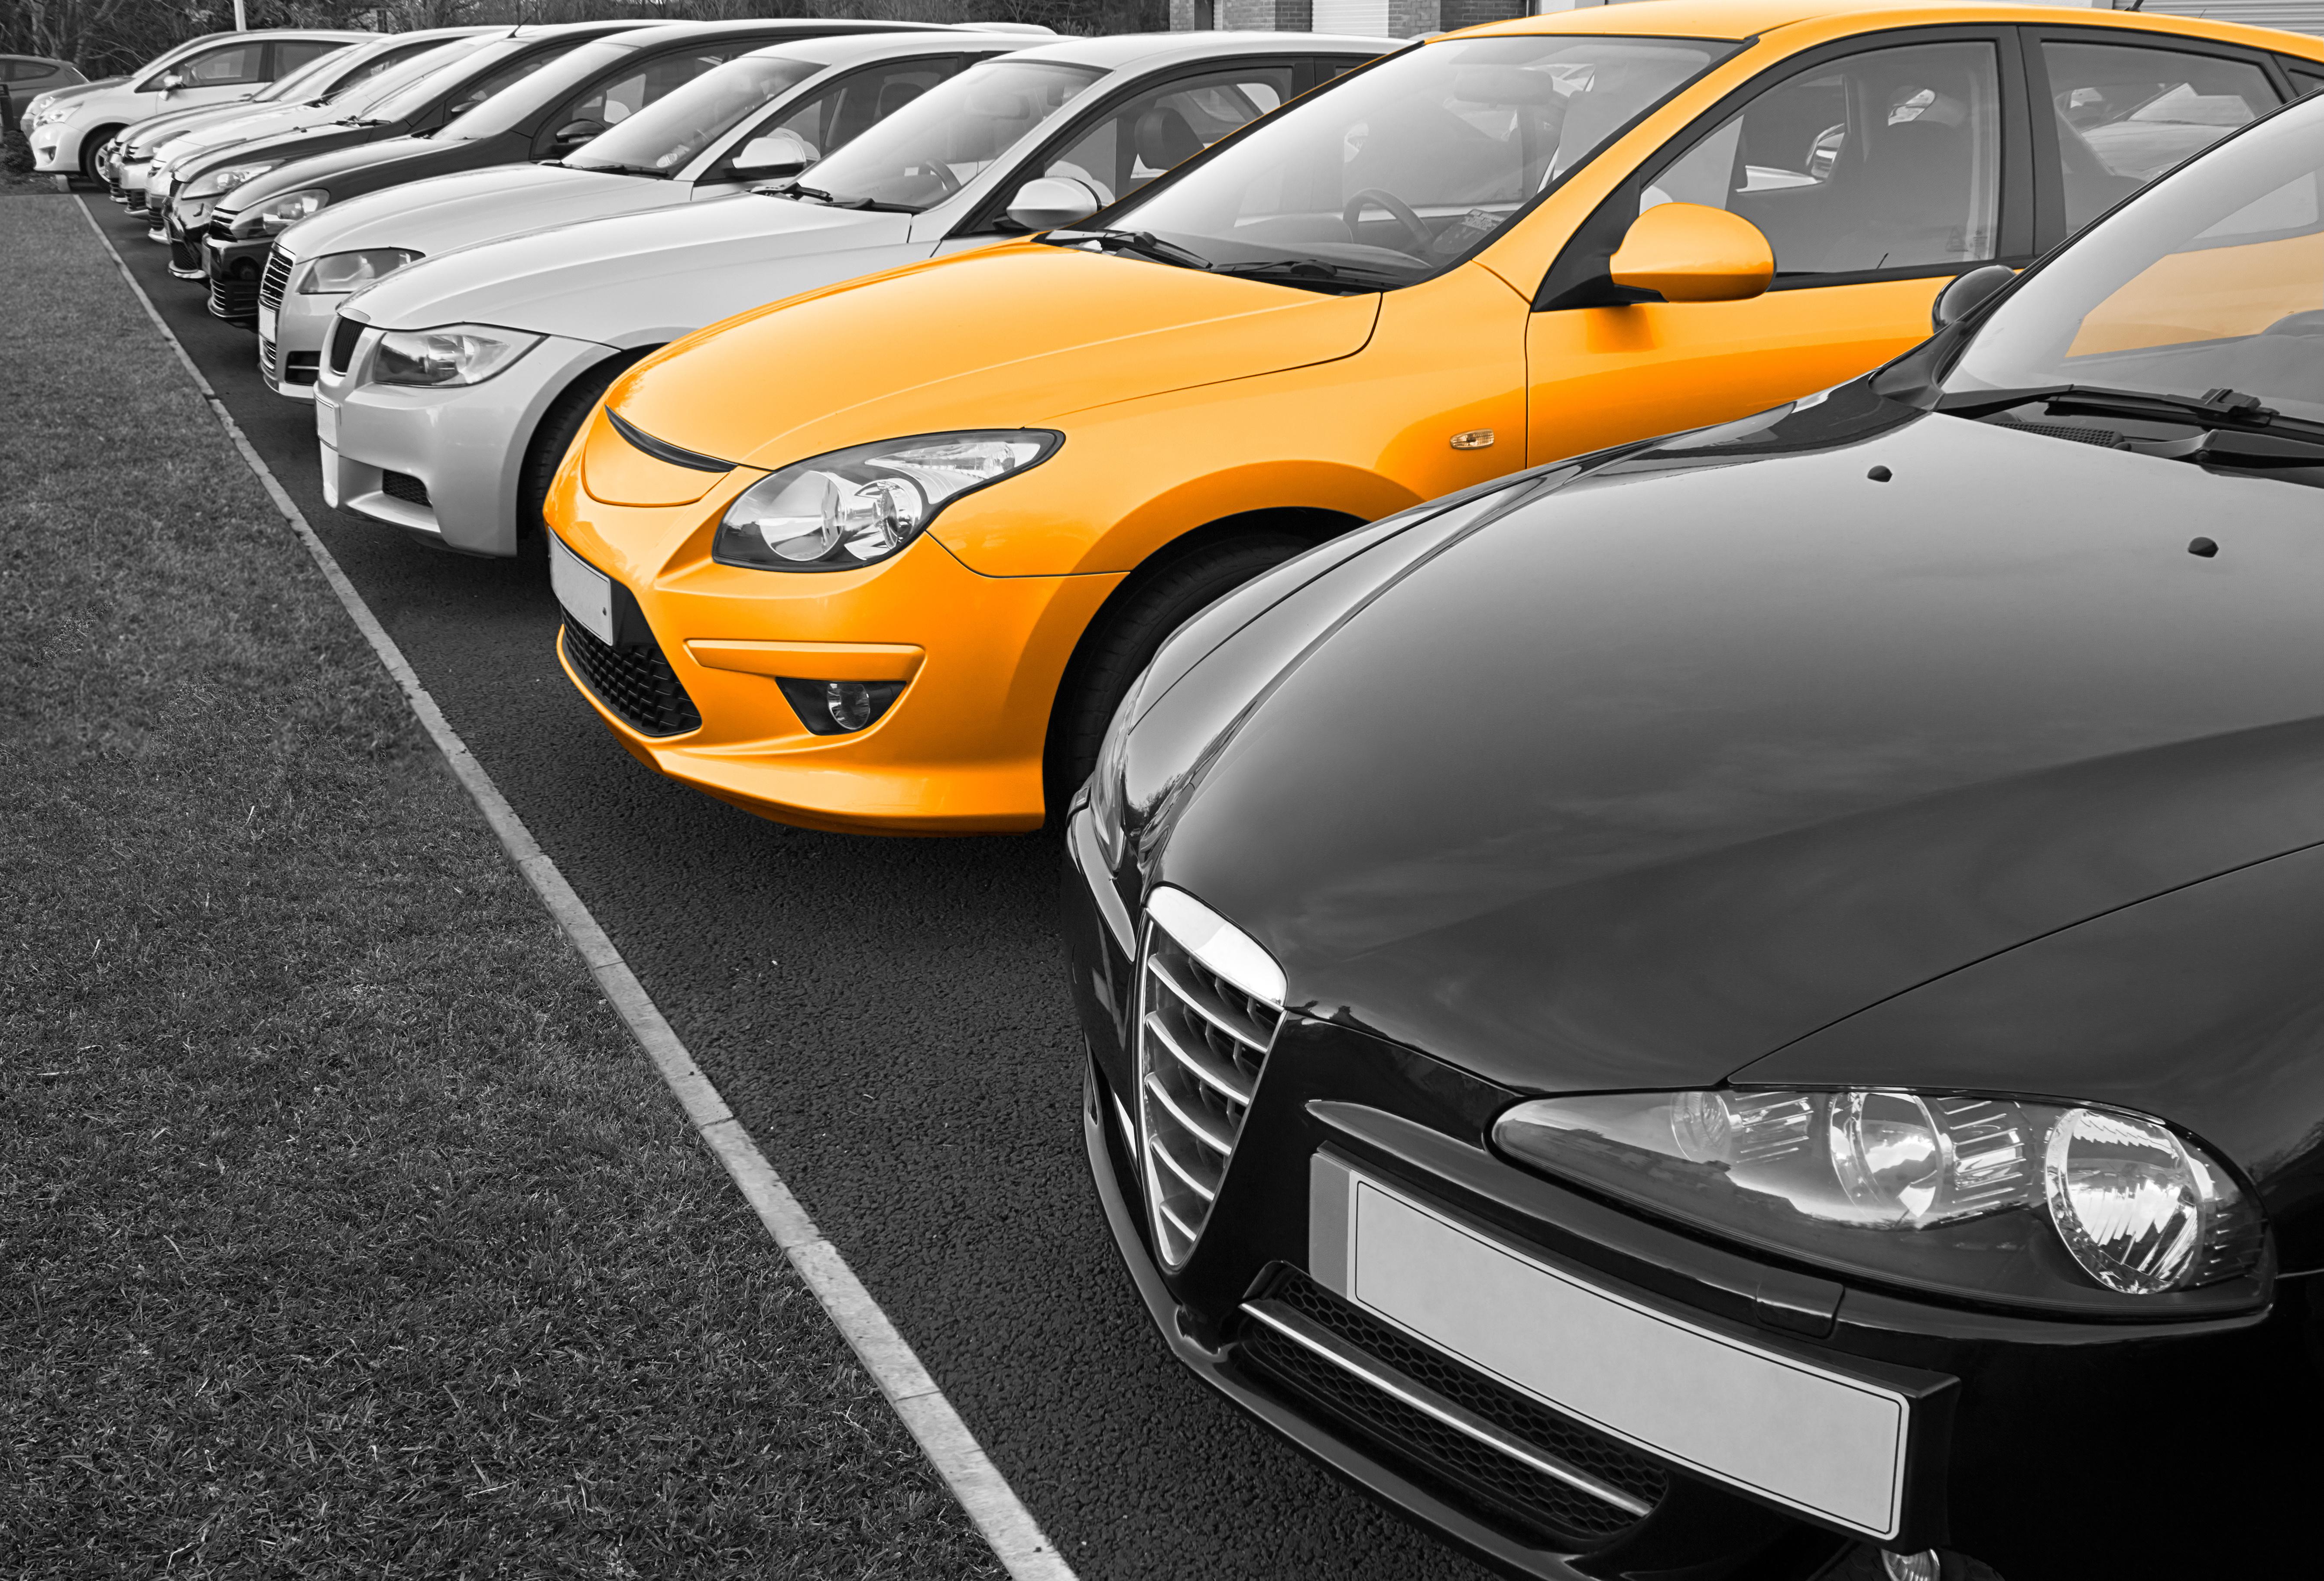 Car Dealership Security Camera Catches Criminals